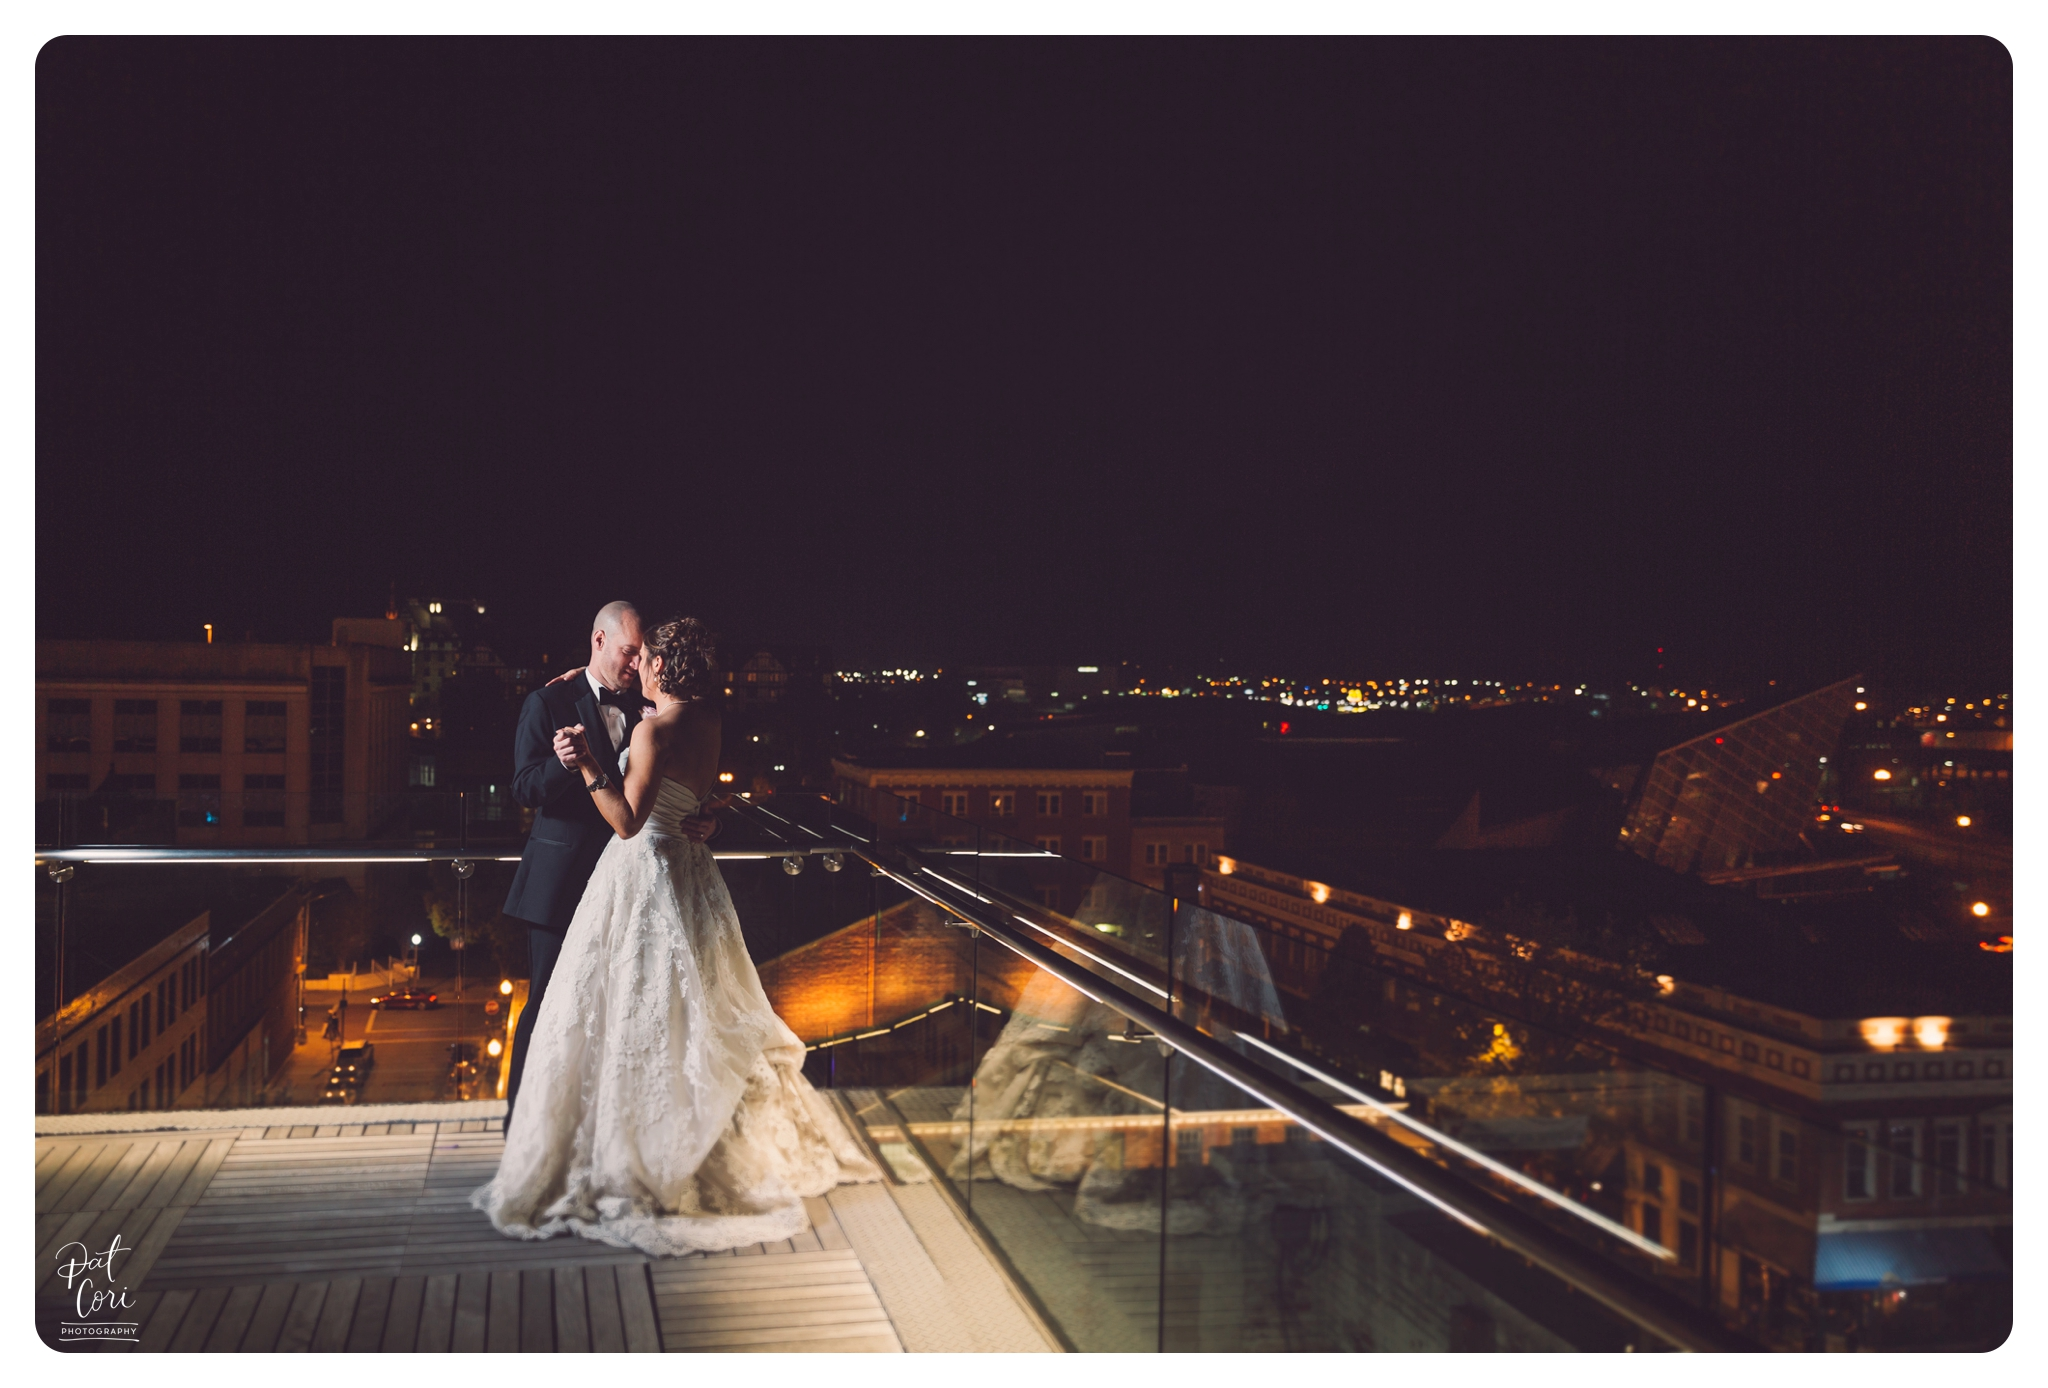 Center-in-the-Square-_-Weddings-Wedding-Photographer-Virginia-053.jpg